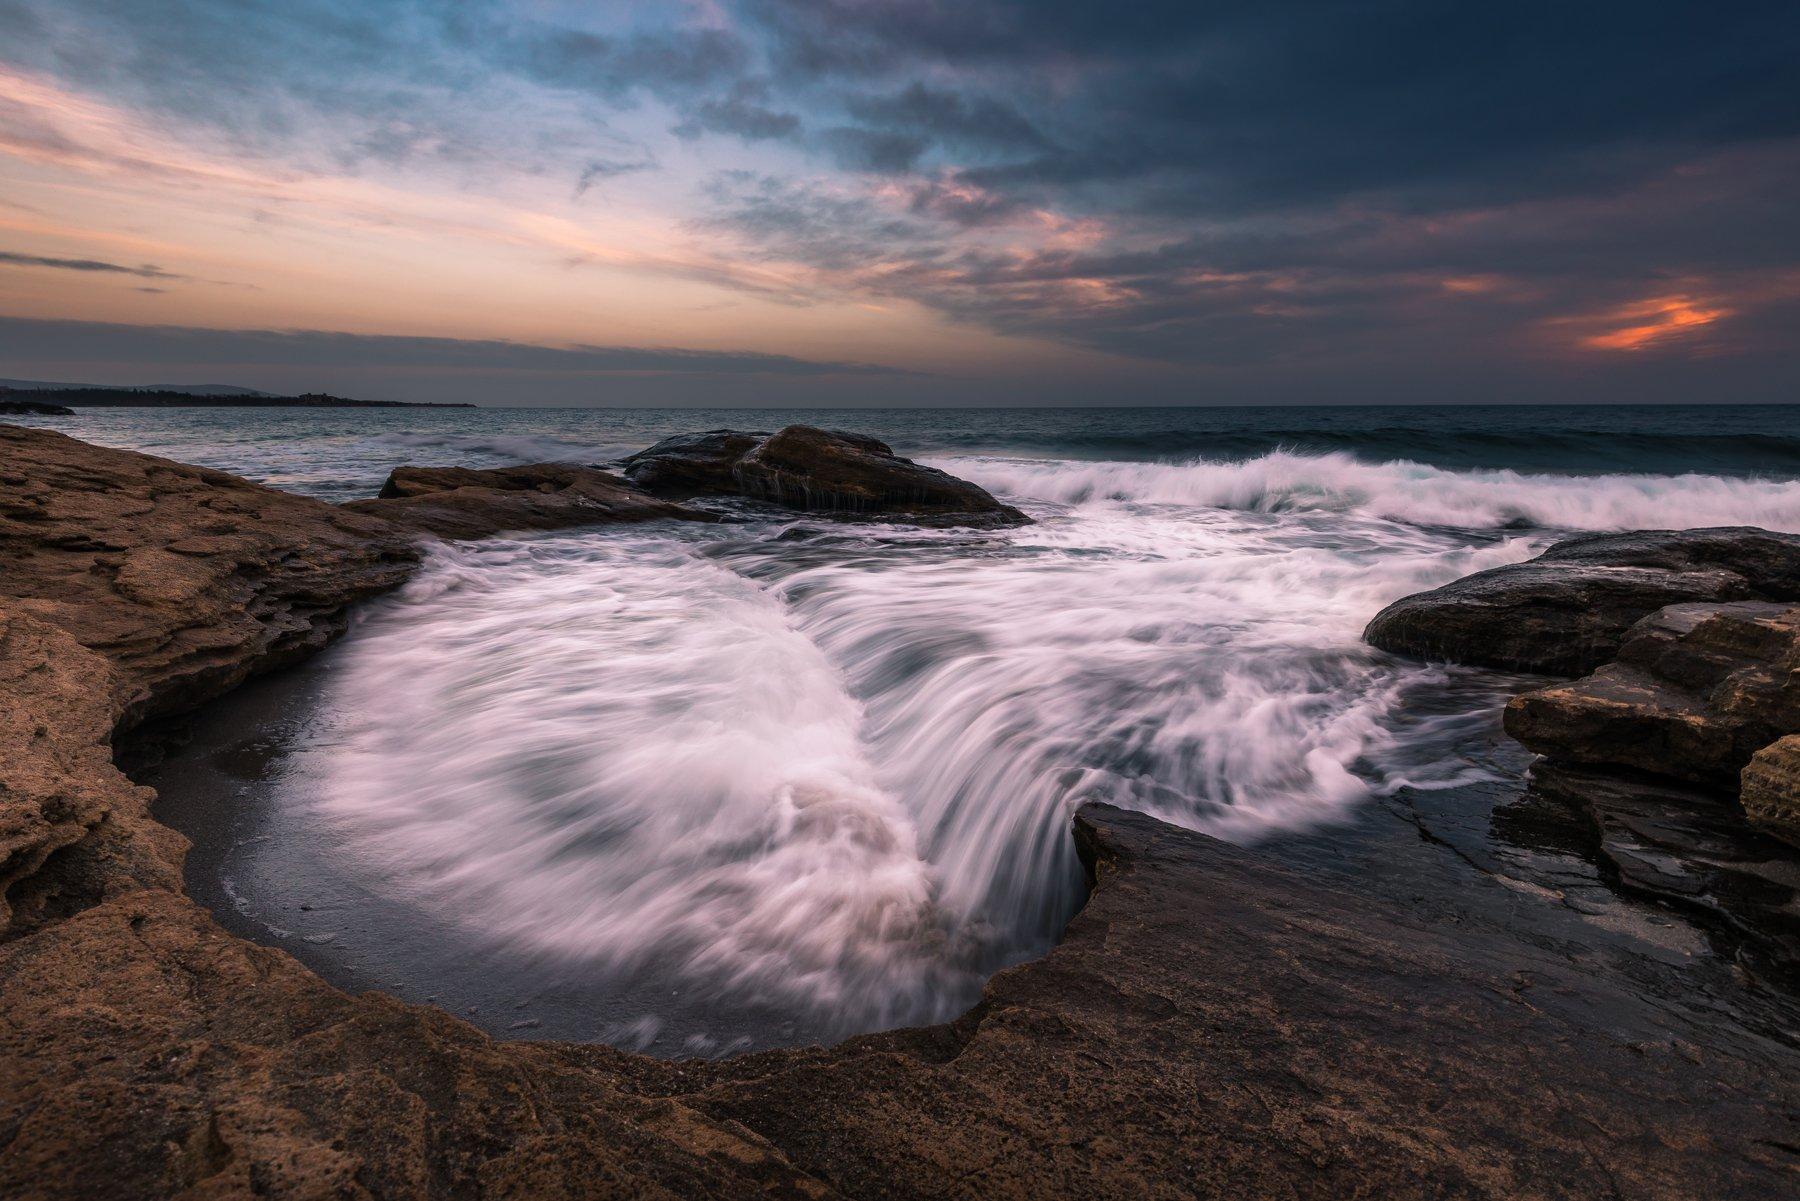 sea,wave,water,sunset,landscape.outdoor,clouds,sky,, Jeni Madjarova